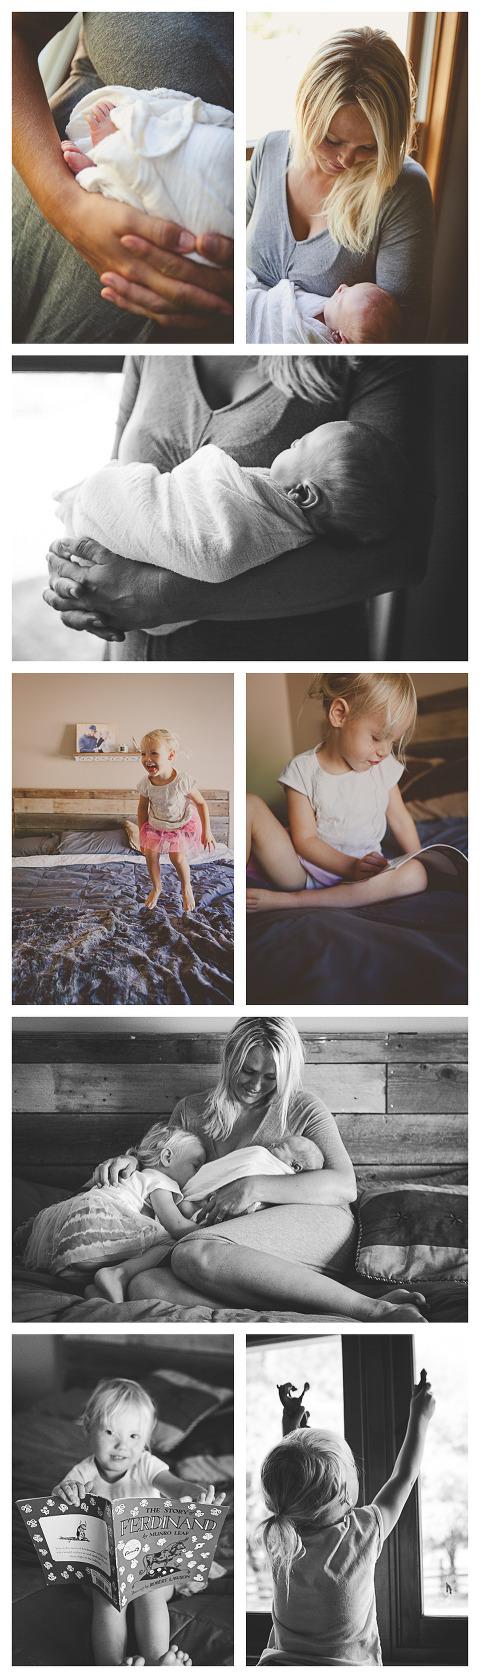 Baby Ryder with Hailey Haberman Ellensburg Lifestyle Newborn Photographer